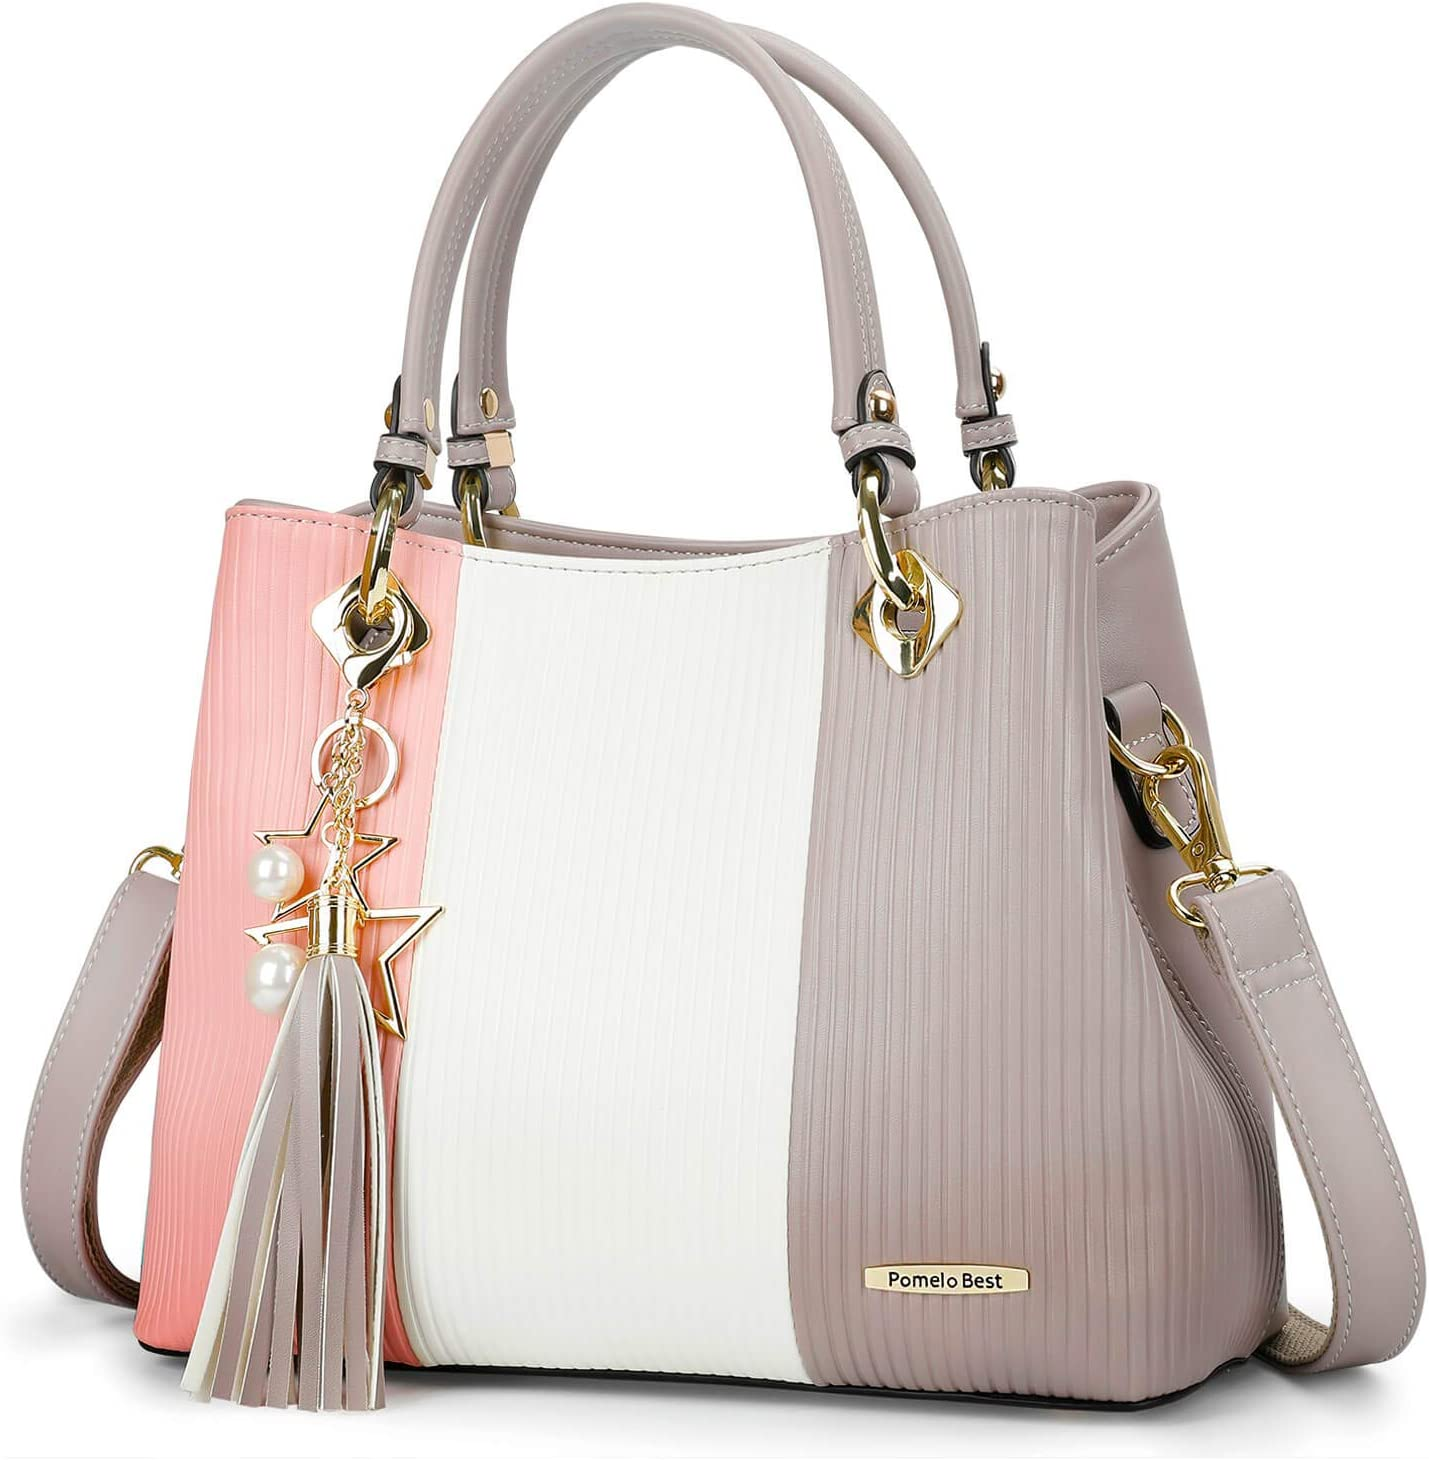 Pomelo Best Damen Handtasche Mehrfarbig gestreift Umhängetasche Shopper Tote Henkeltasche (Rosa): Amazon.de: Koffer - Tasche rosa